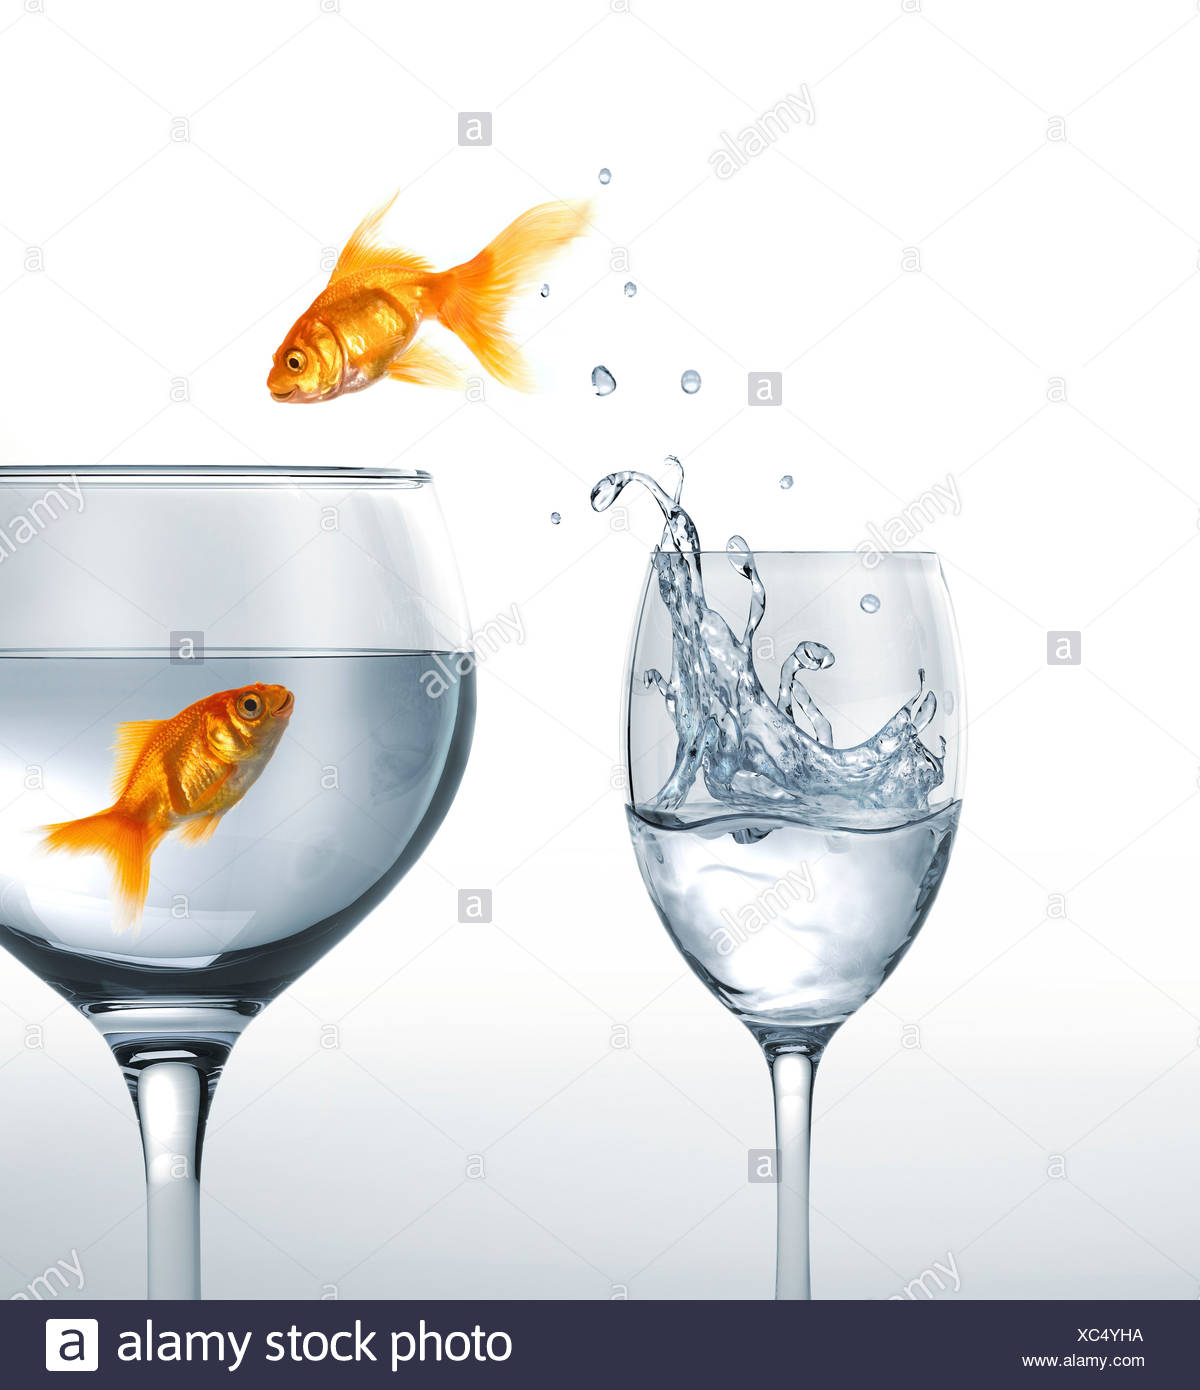 Saltar goldfish ilustraciones Imagen De Stock